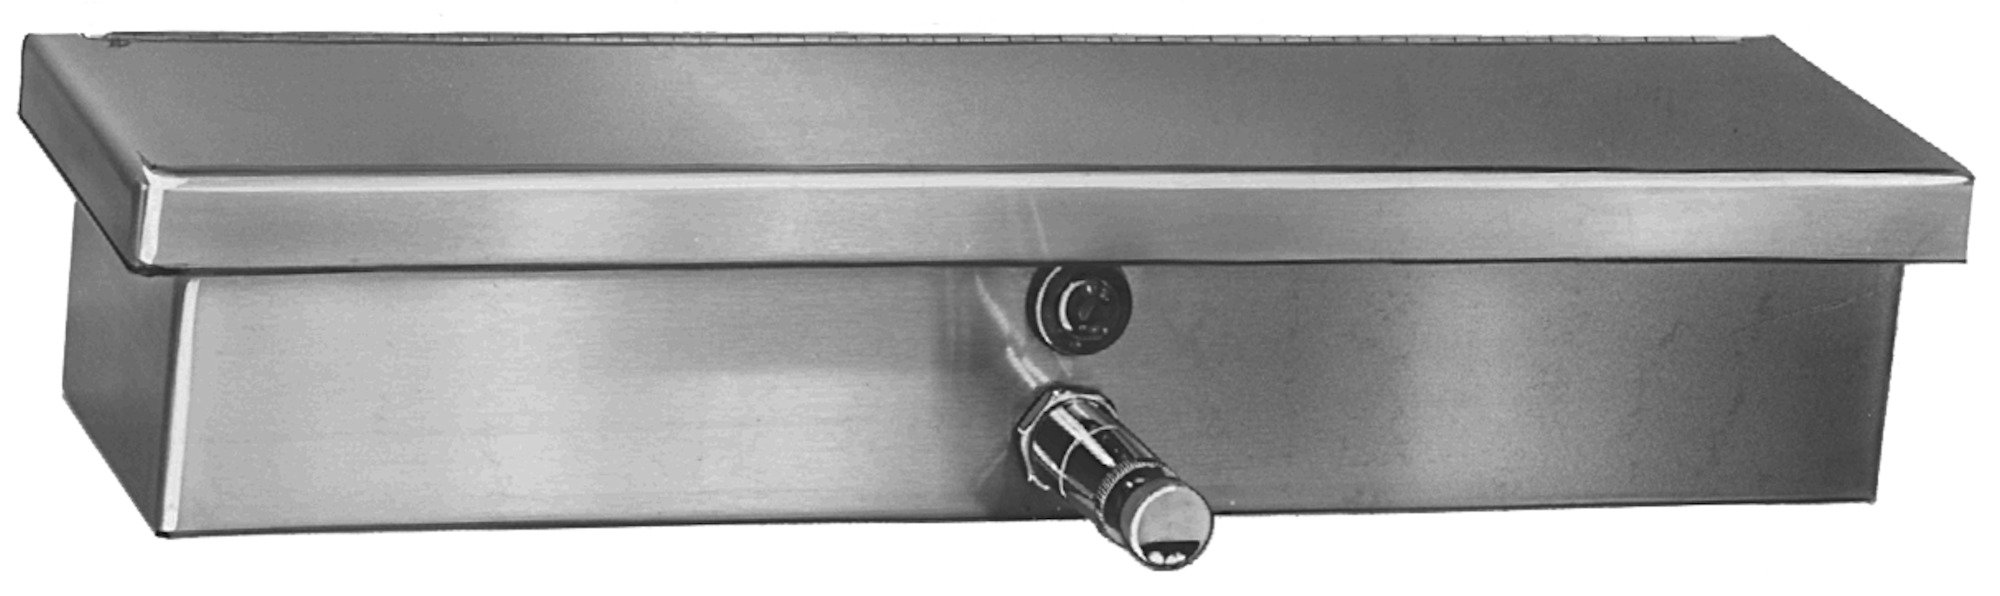 Bradley Manual Soap Dispenser With Shelf 661 | Accurate Door & Hardware